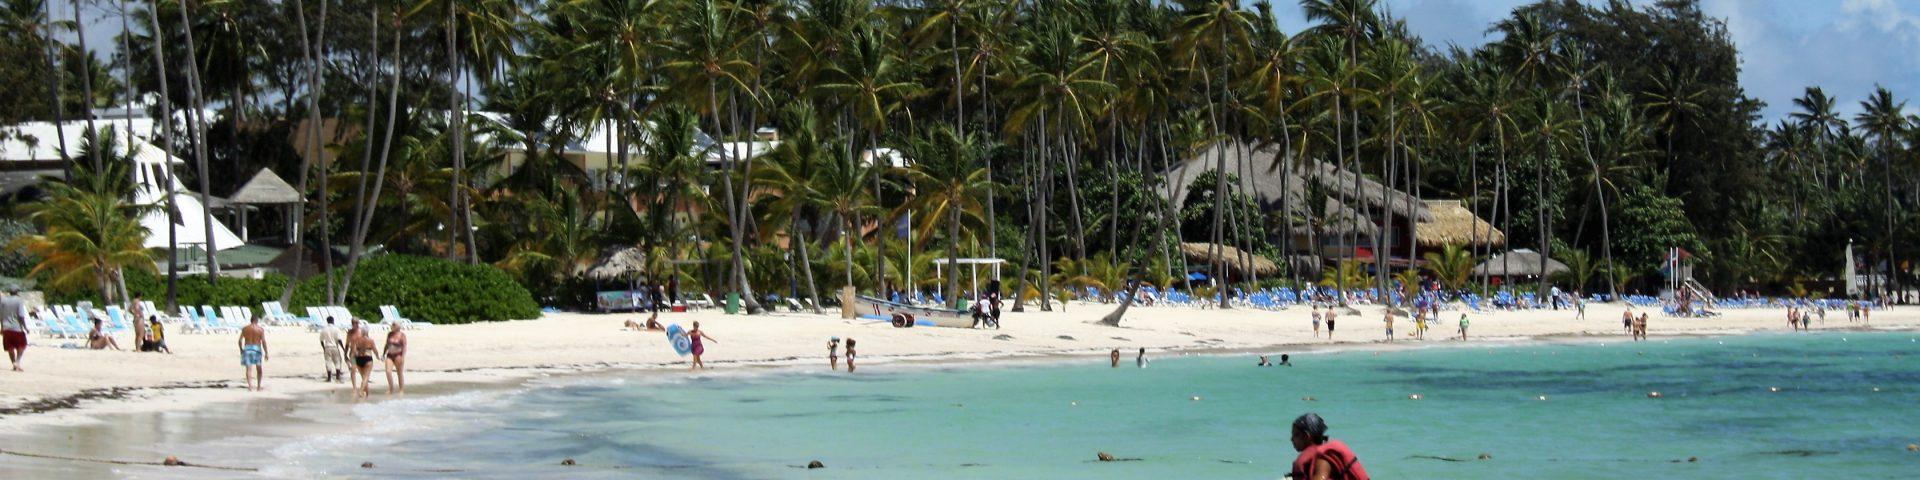 Republica Dominicana plaja Punta Cana